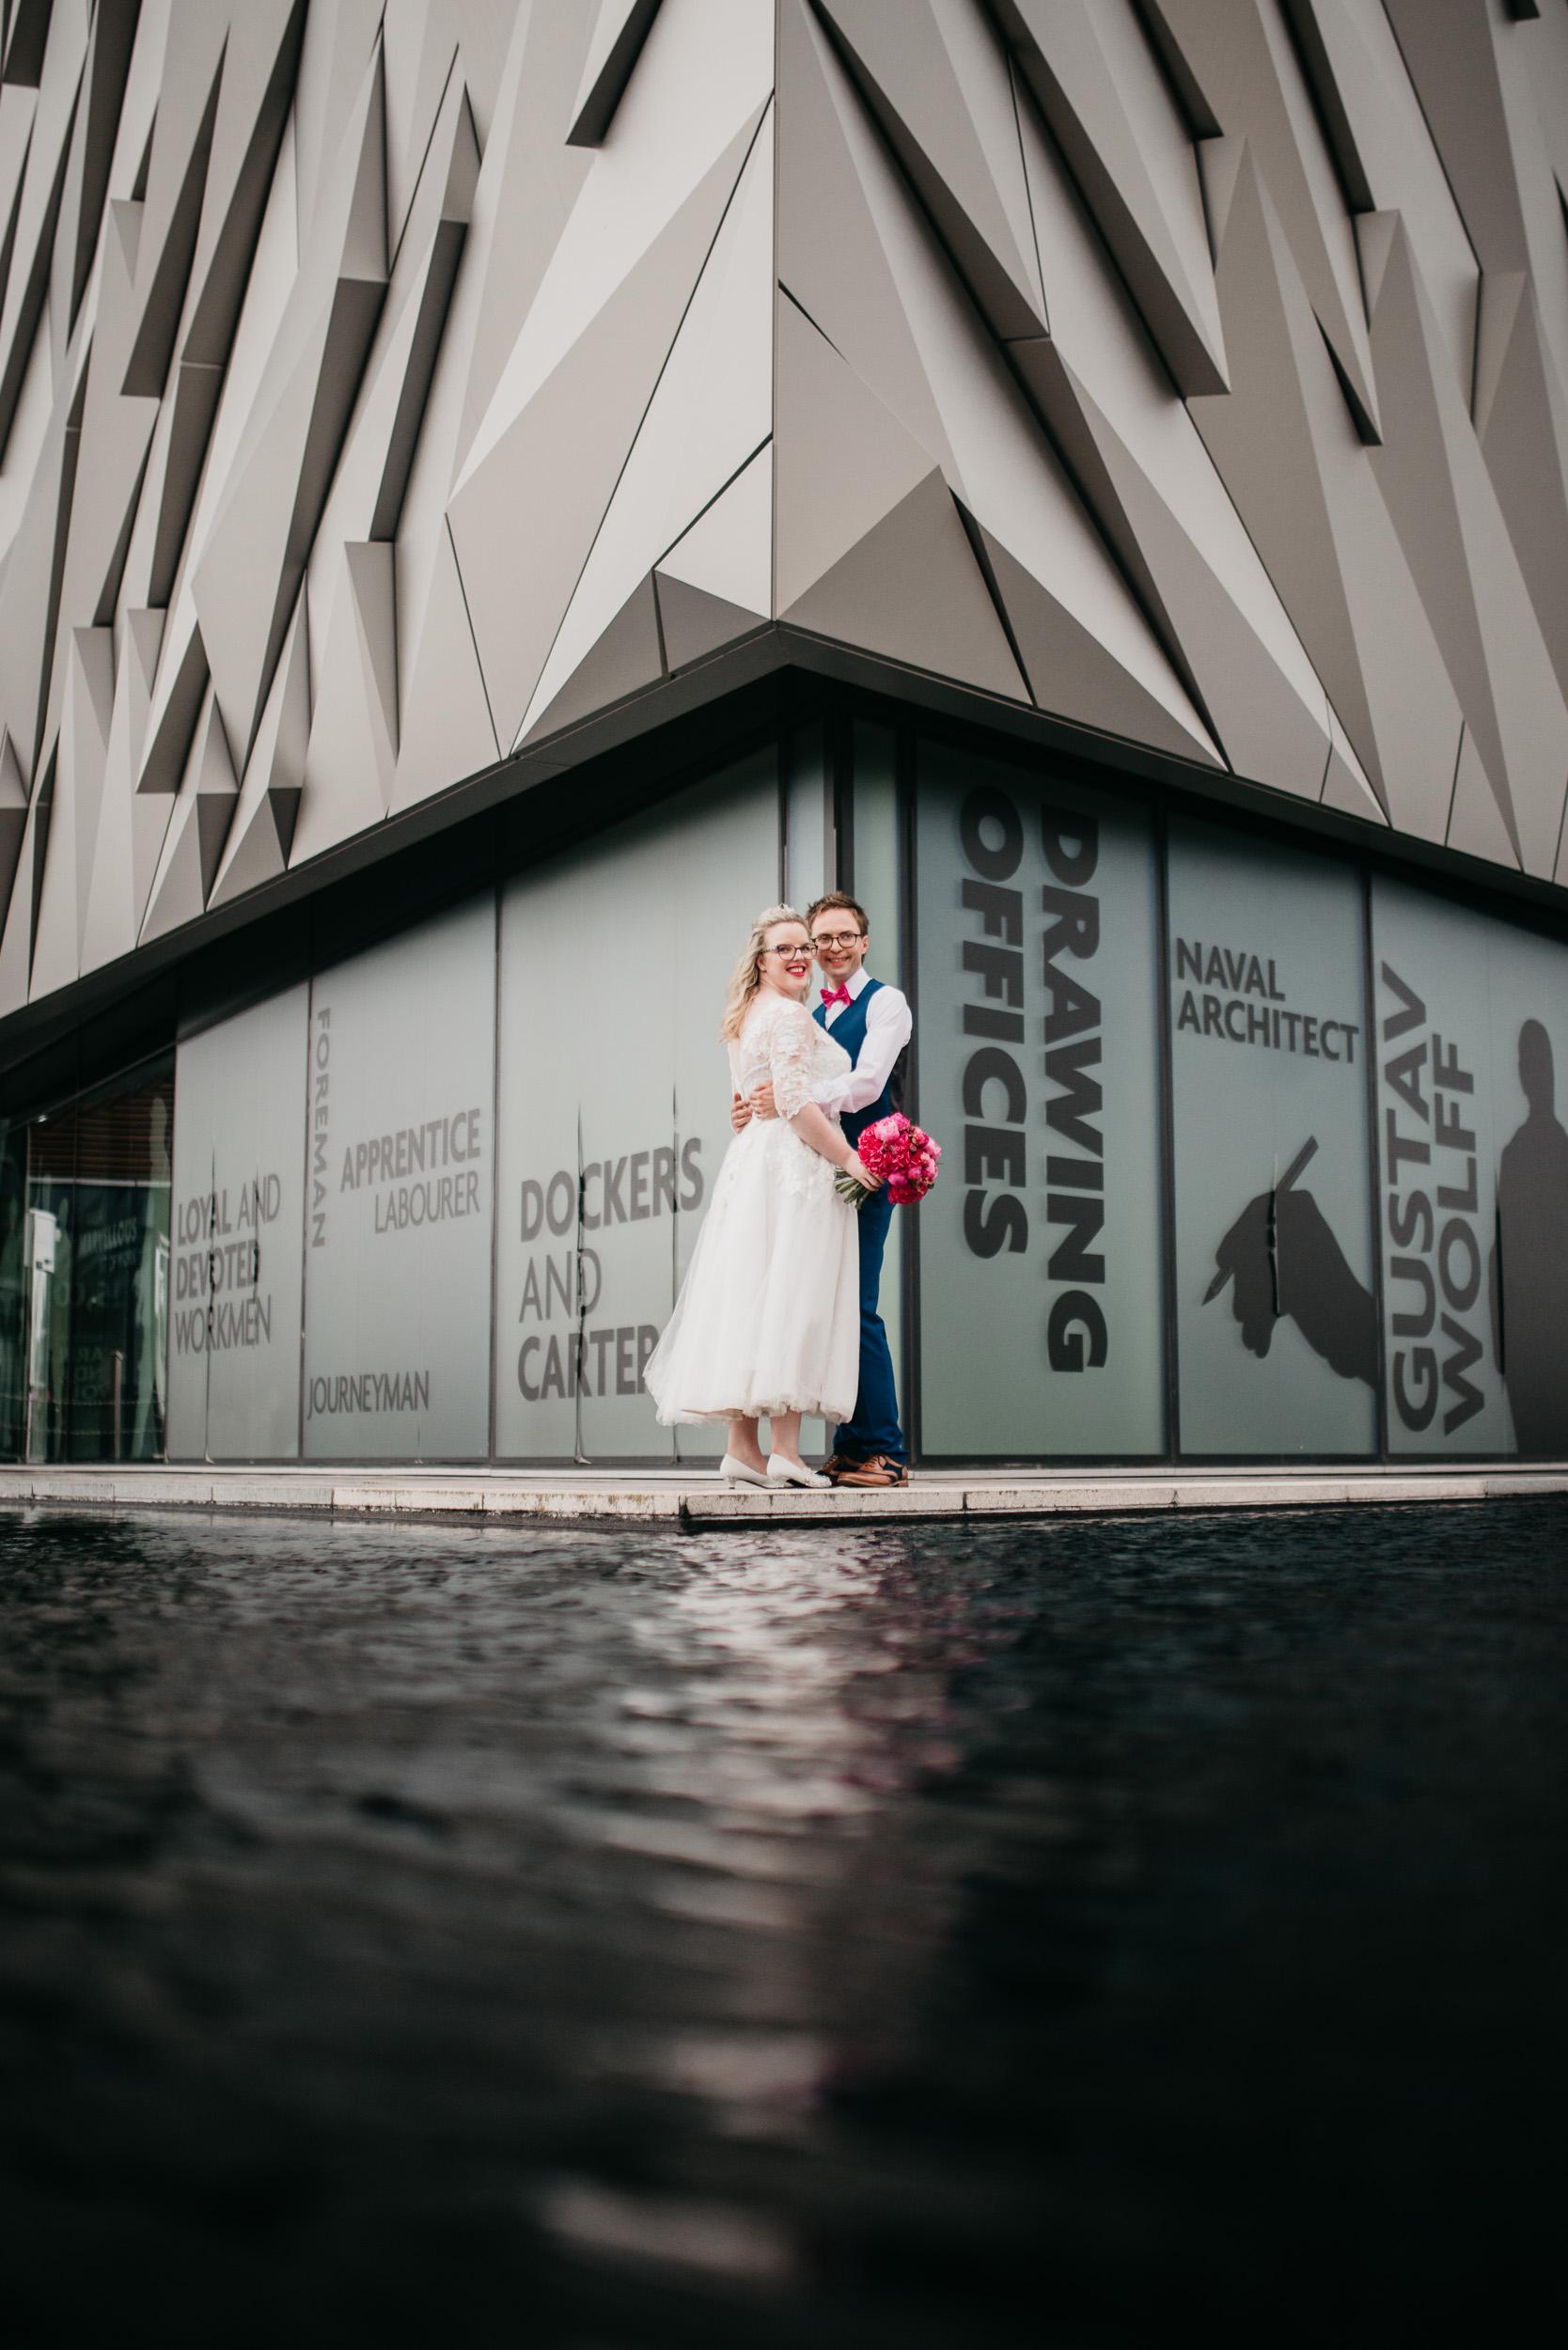 wedding photogaphy peter mackey 2018 h-1-3.jpg